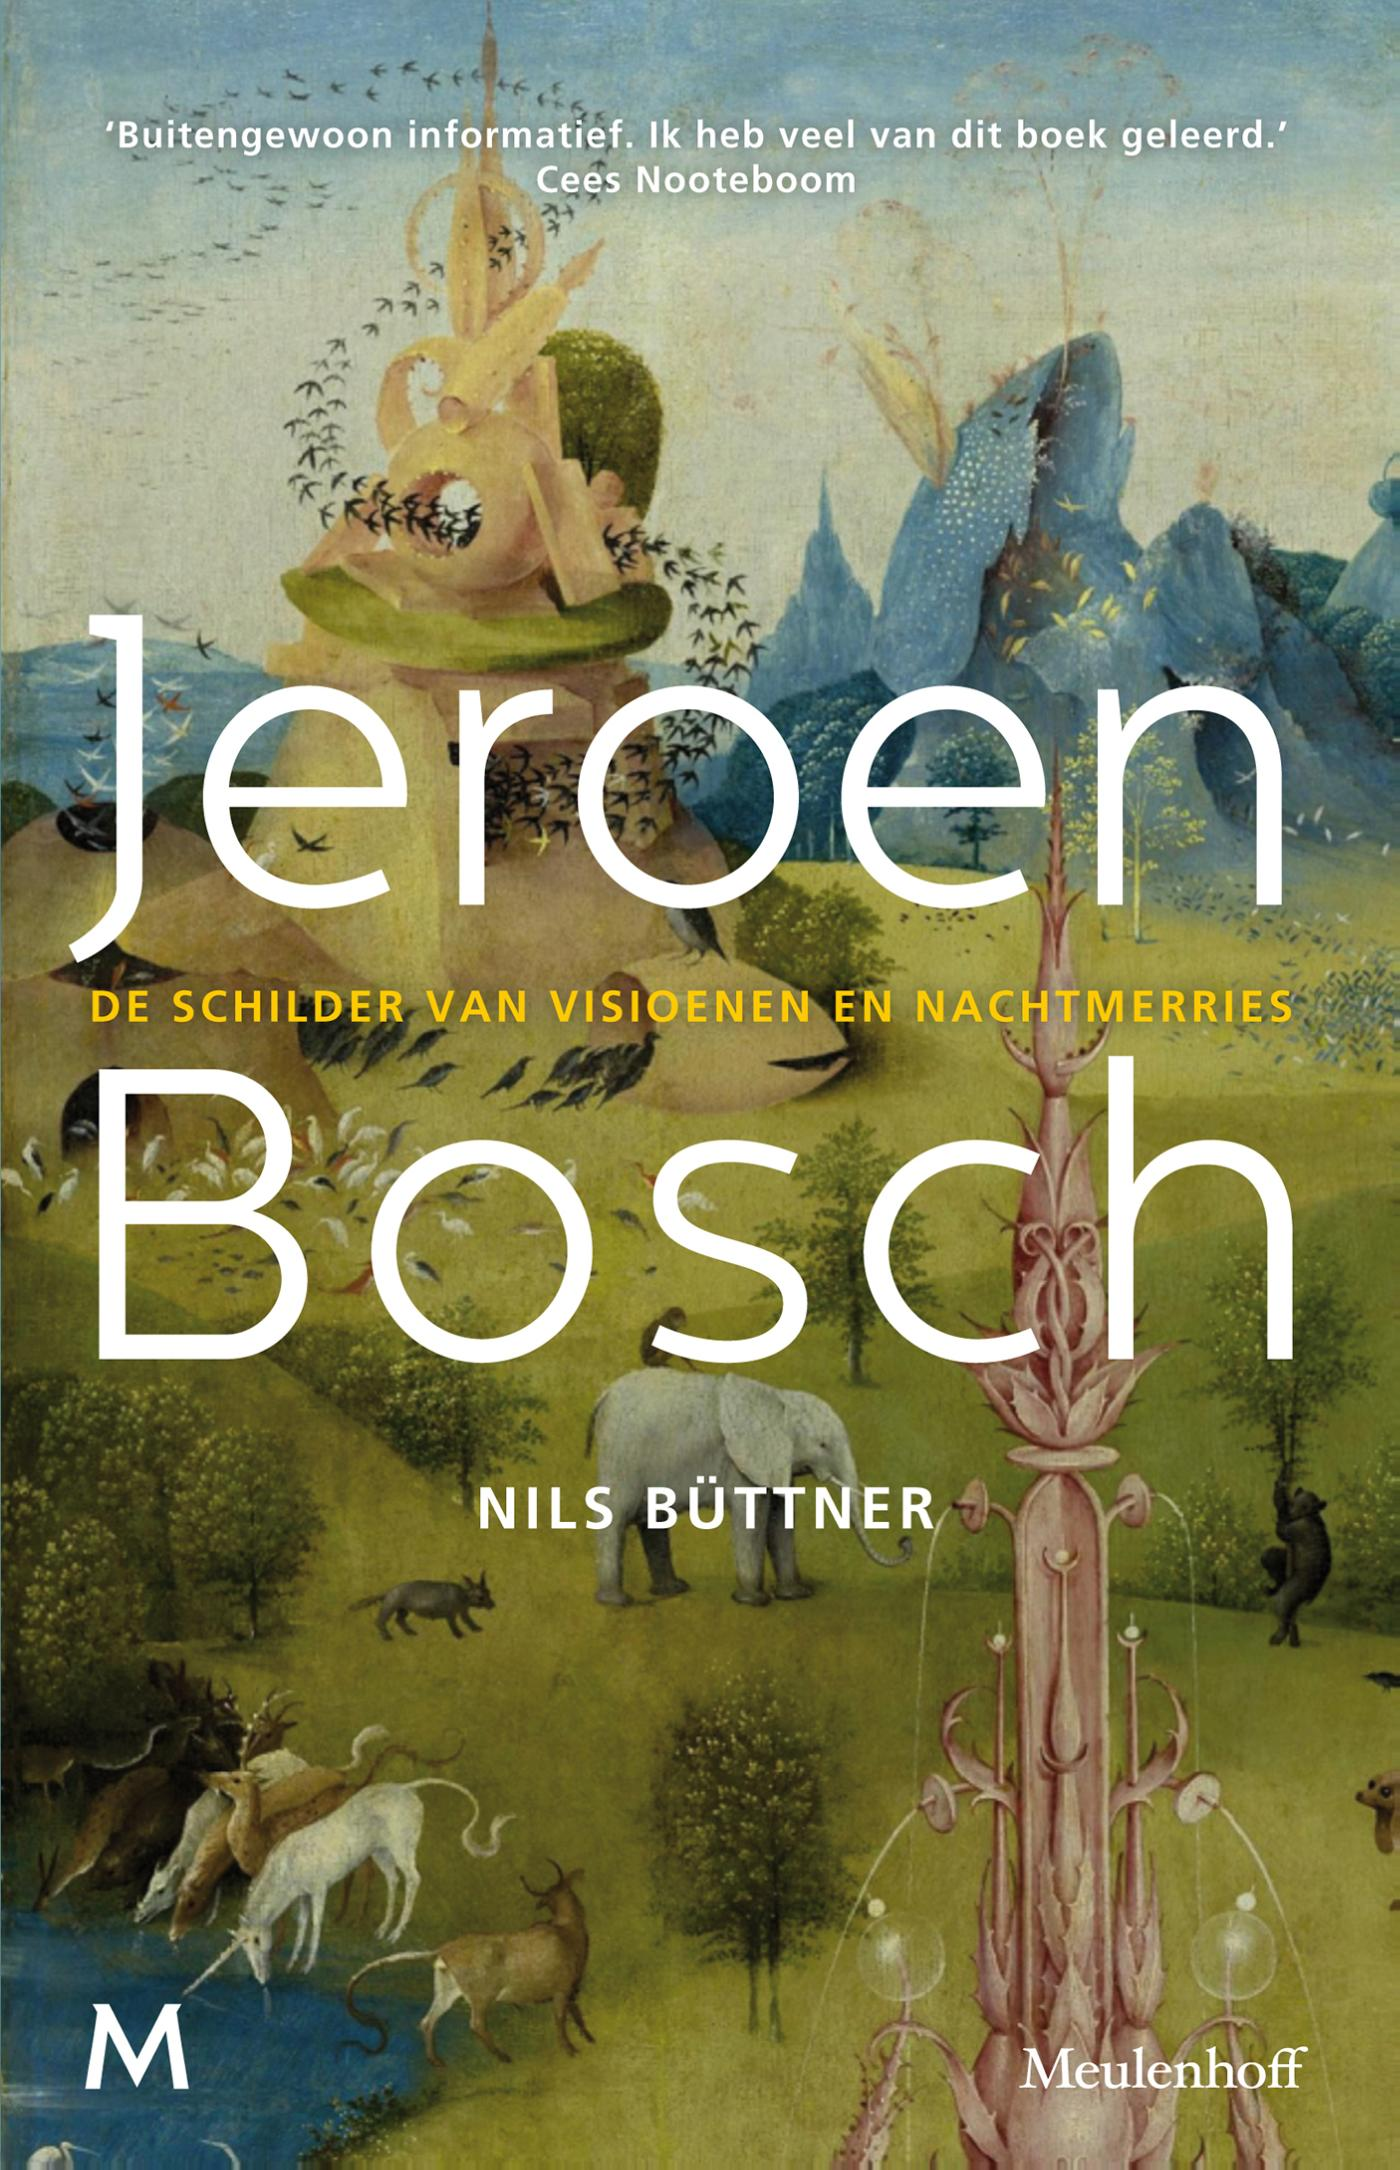 Cover Jeroen Bosch